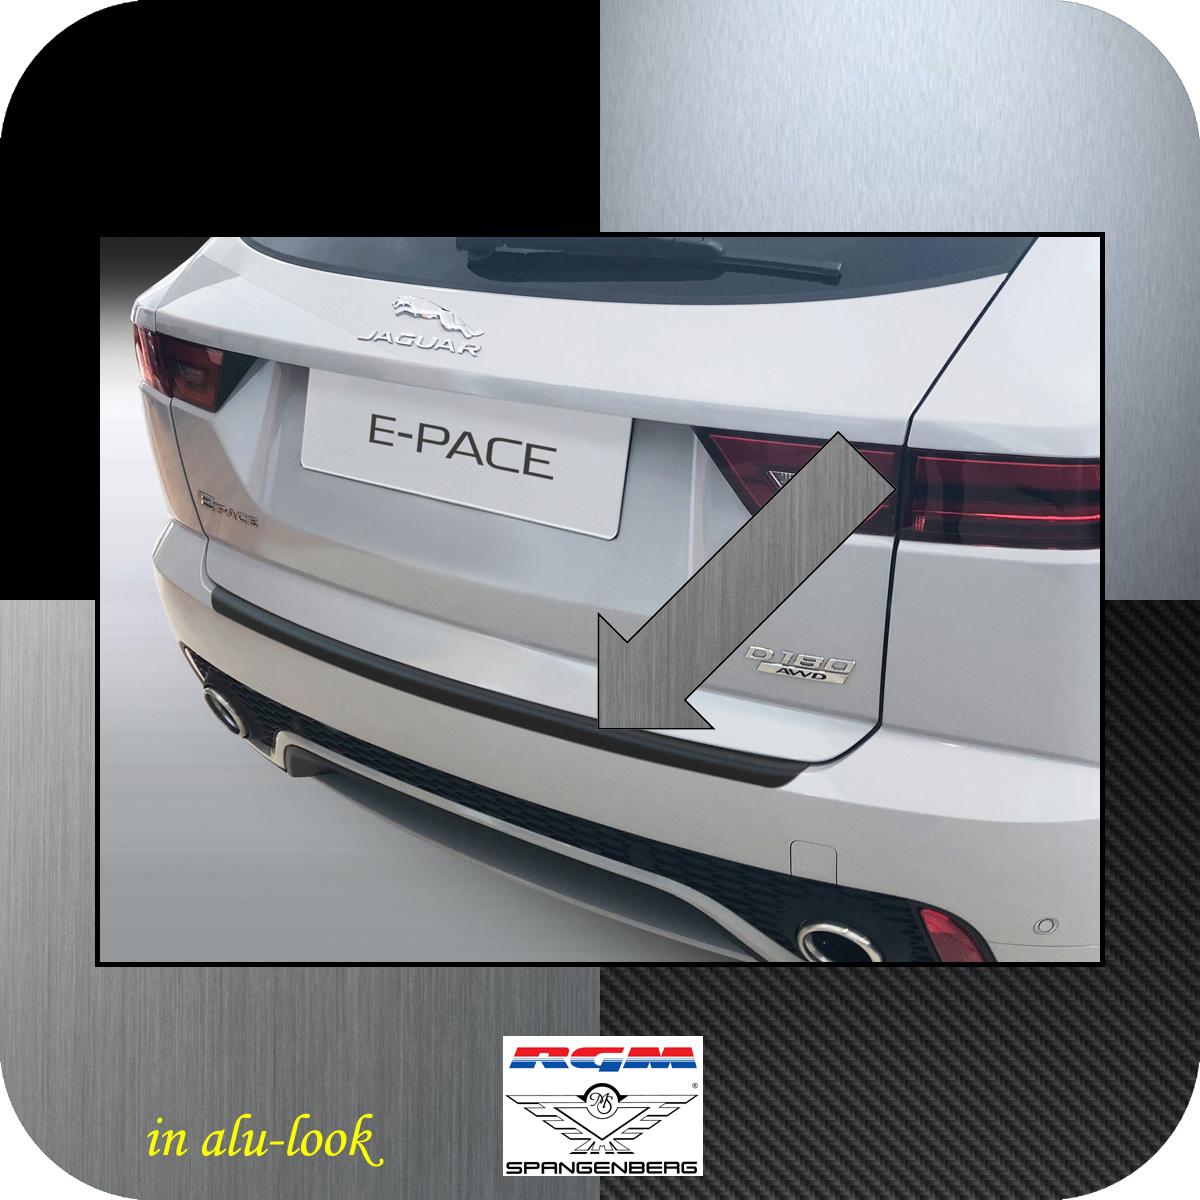 Ladekantenschutz Alu-Look Jaguar E-Pace X540 SUV ab Baujahr 09.2017- 3504794